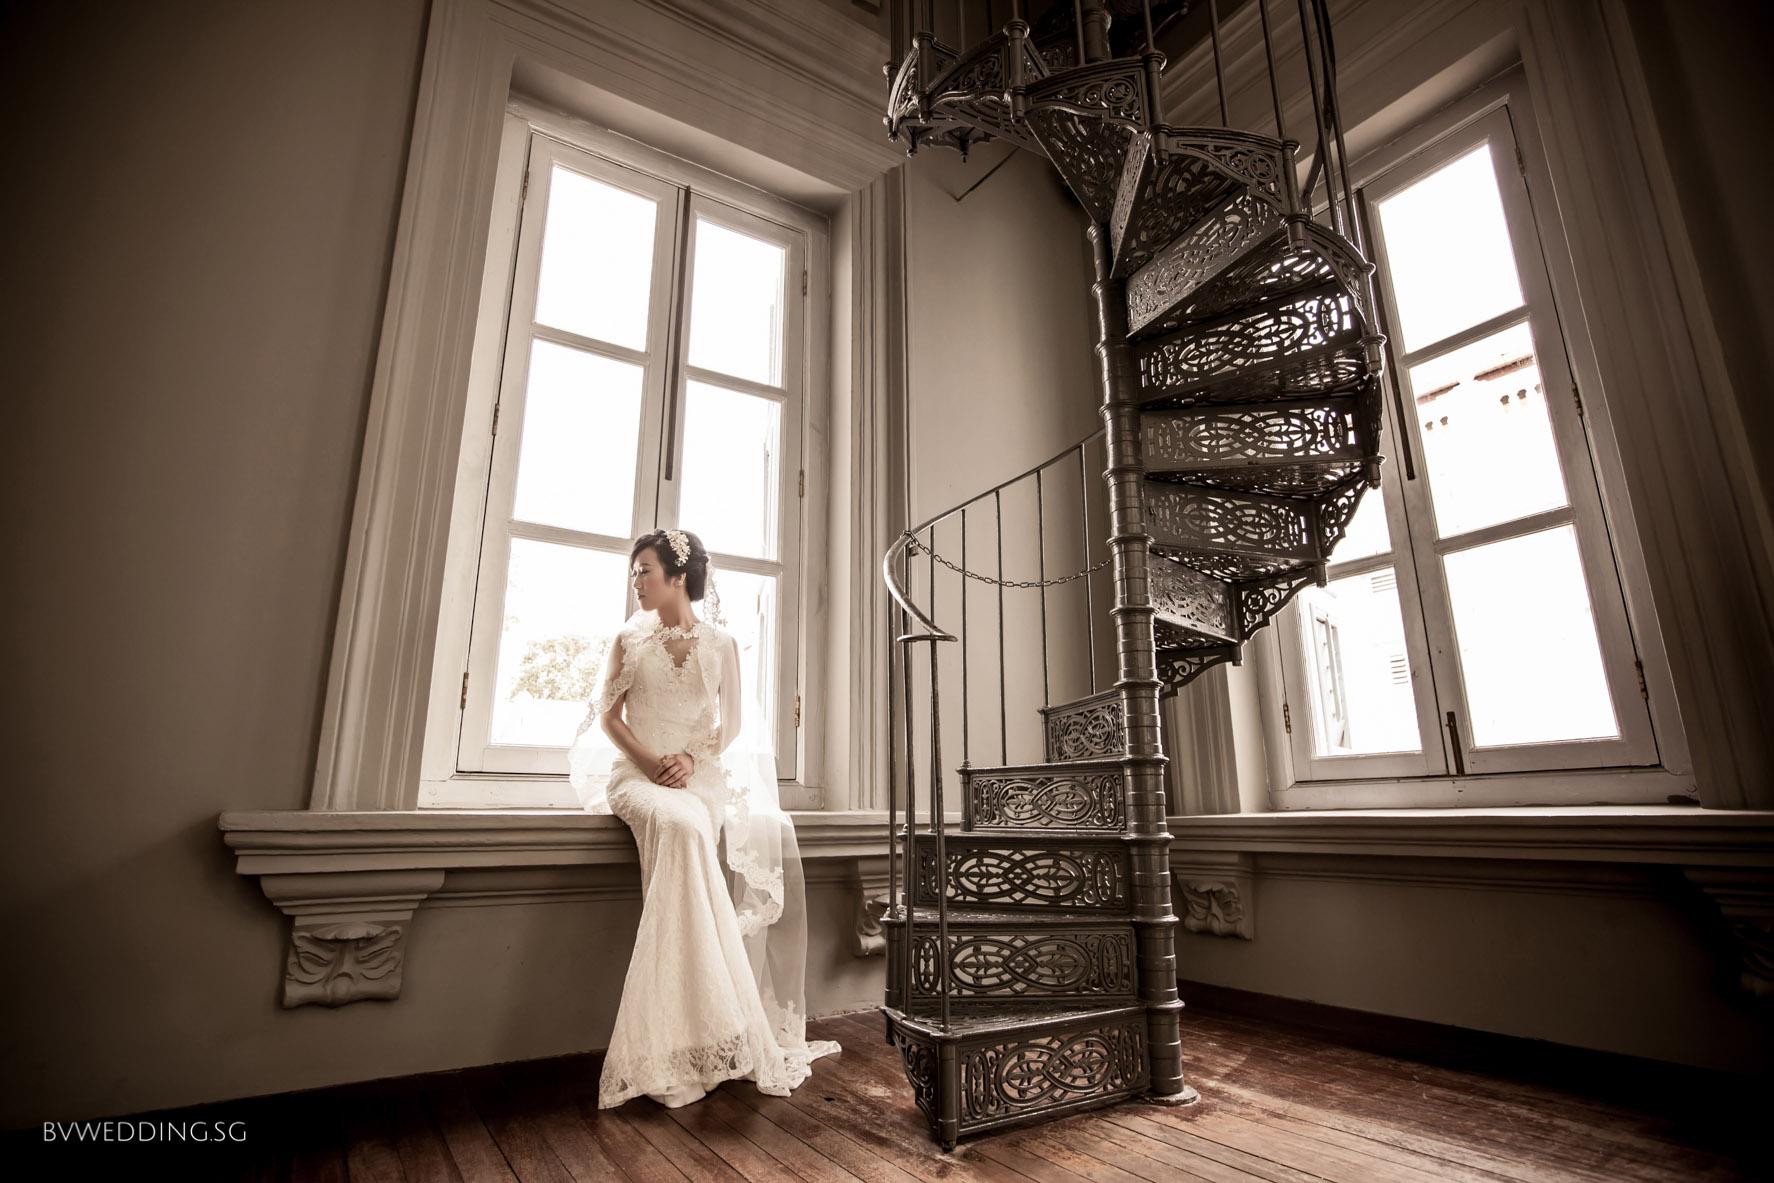 Pre-wedding photoshoot at national museum(indoor)